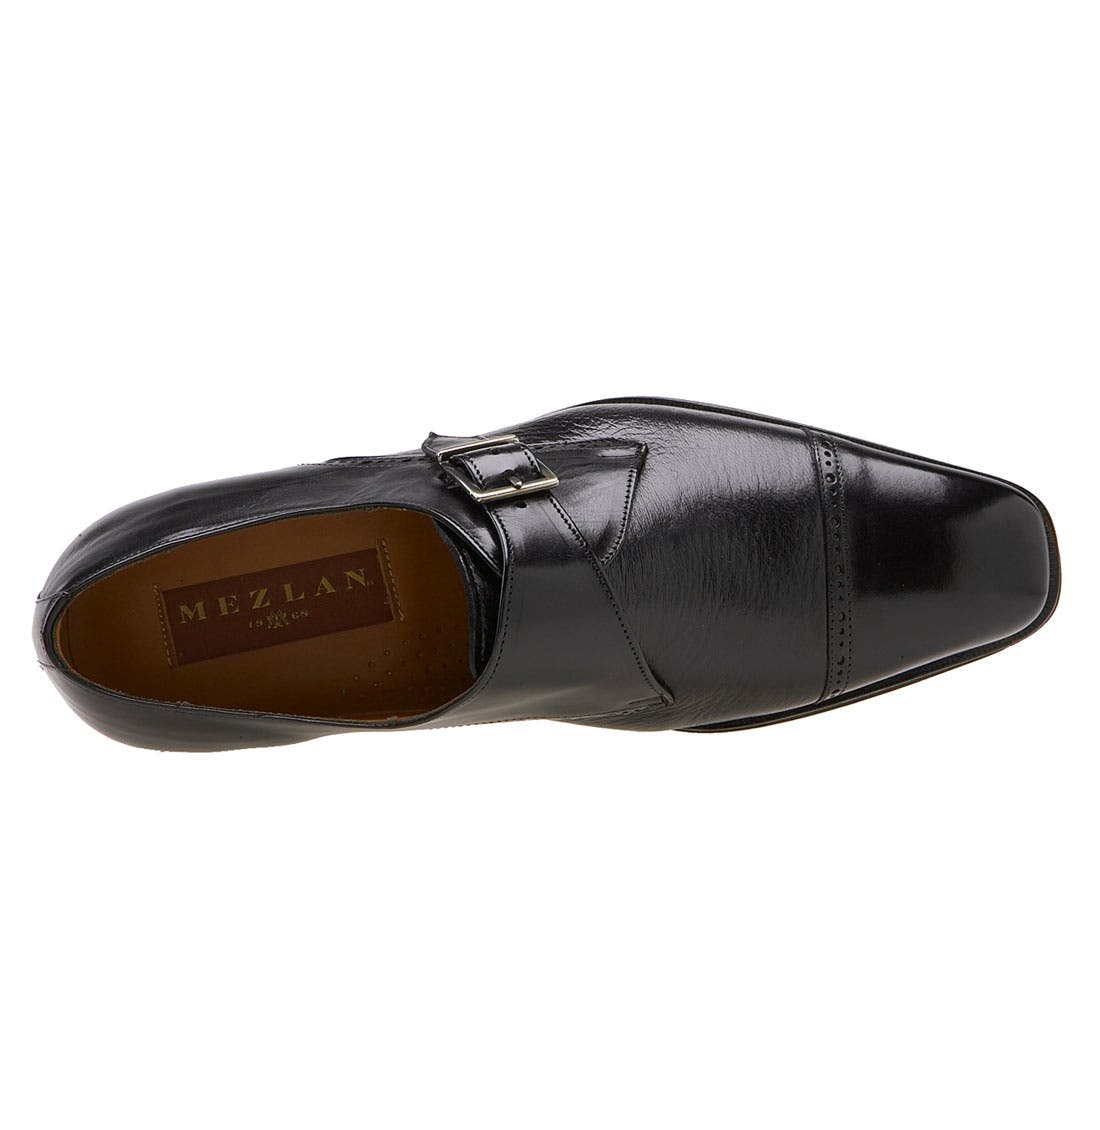 Alternate Image 3  - Mezlan 'Mercker II' Monk Strap Loafer